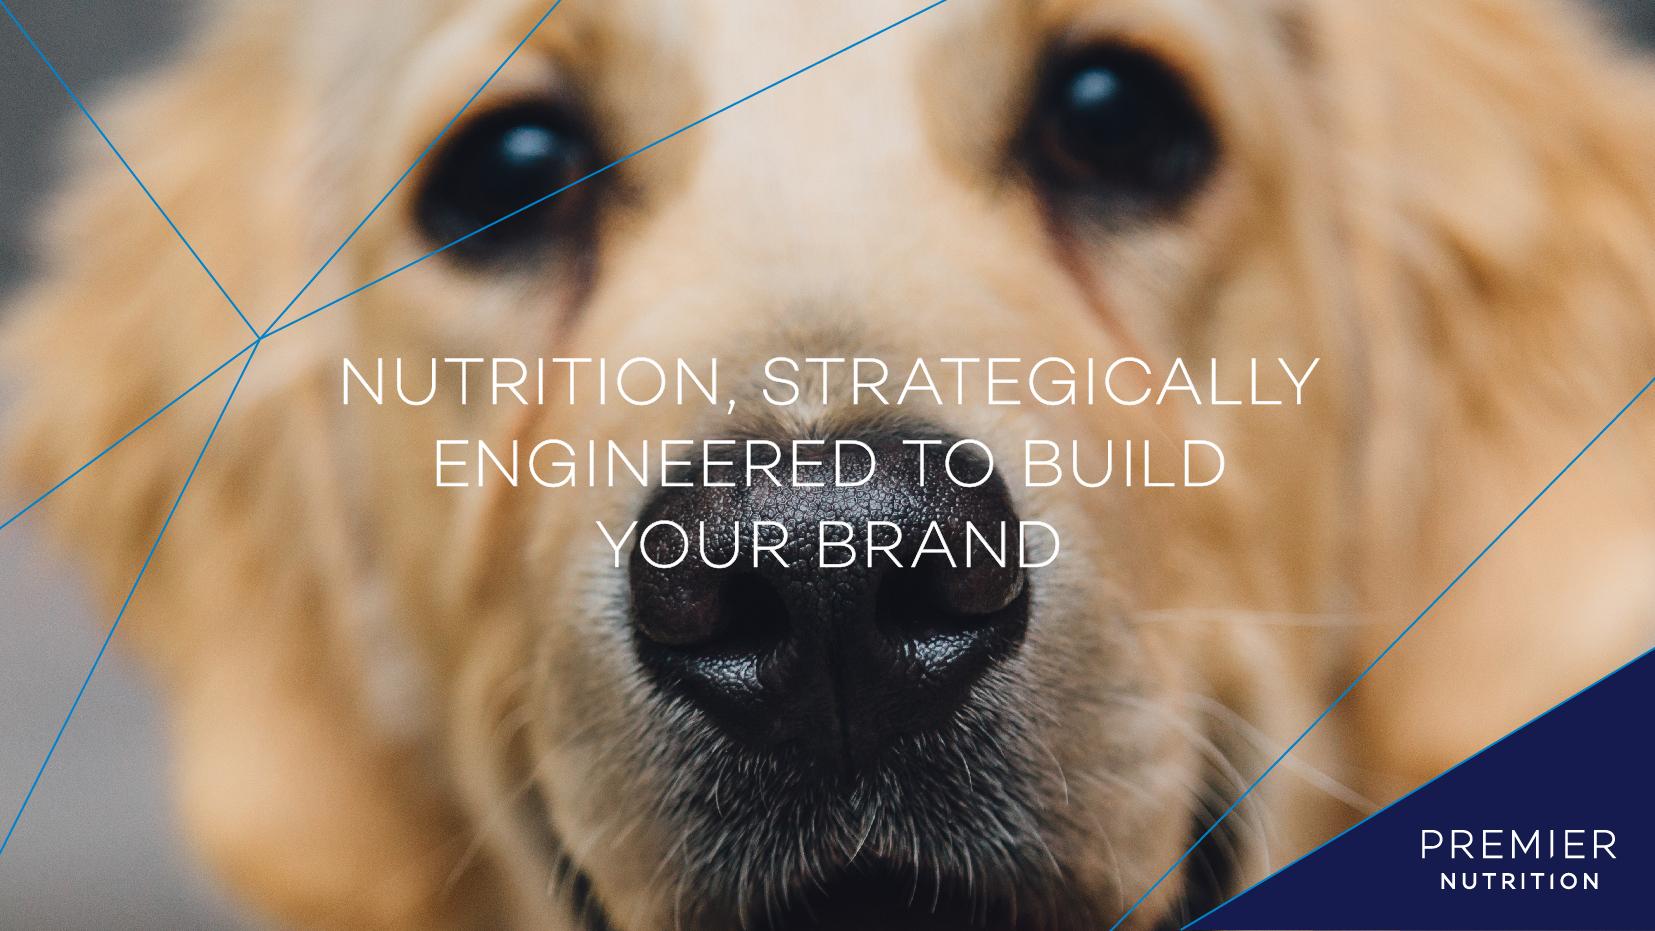 Premier Nutrition brand messaging